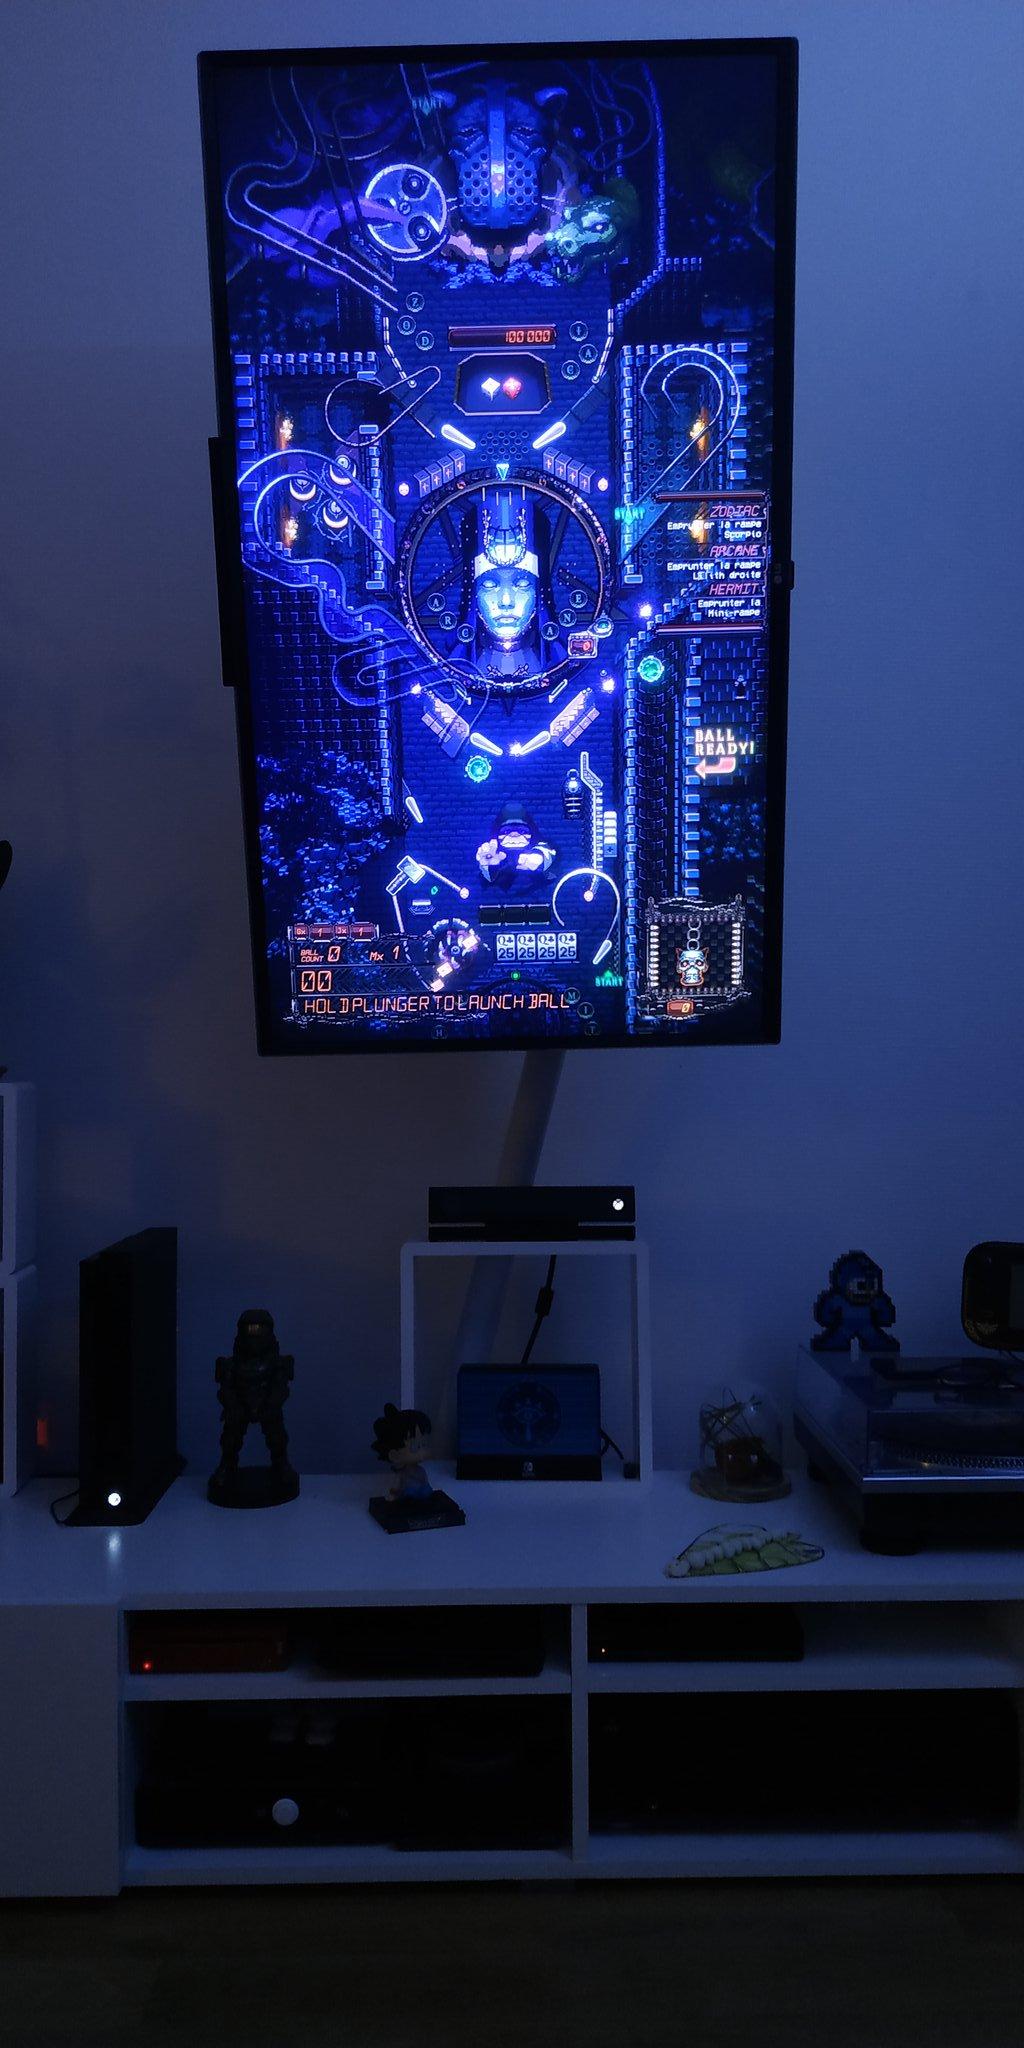 Demon's Tilt (One / Switch / PC) Img_2224